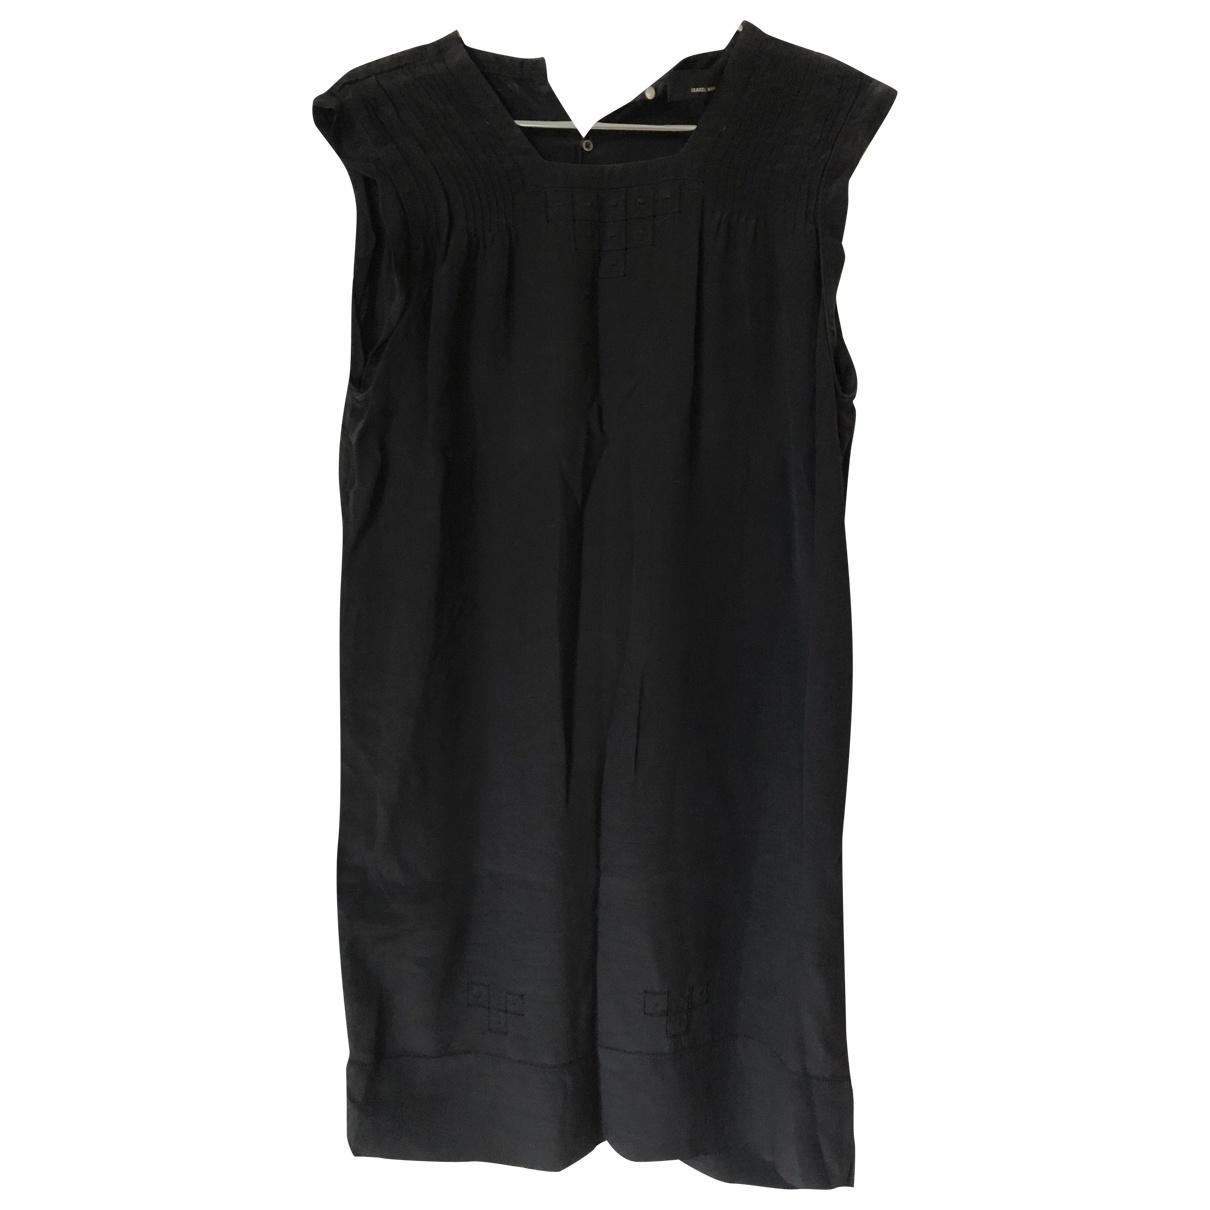 Isabel Marant \N Black Silk dress for Women 0 0-5